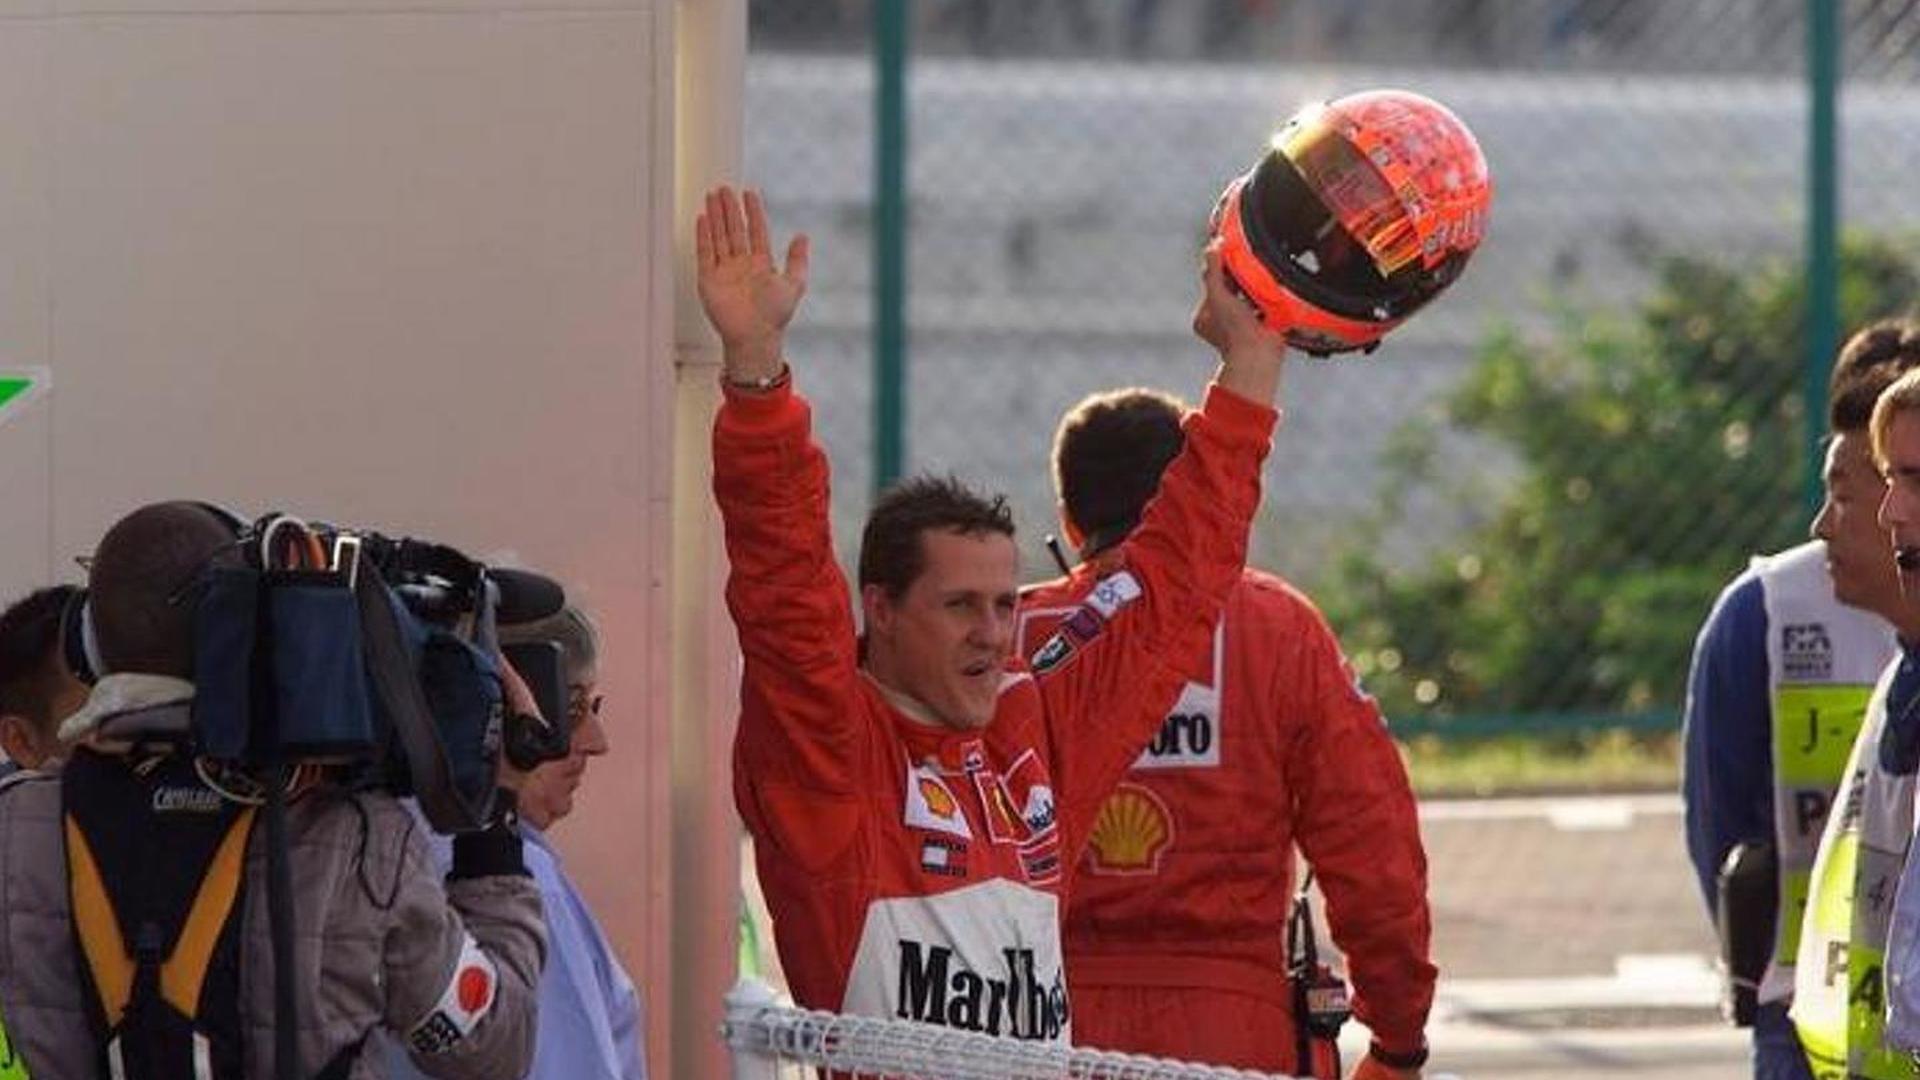 Friend admits future unclear for Schumacher